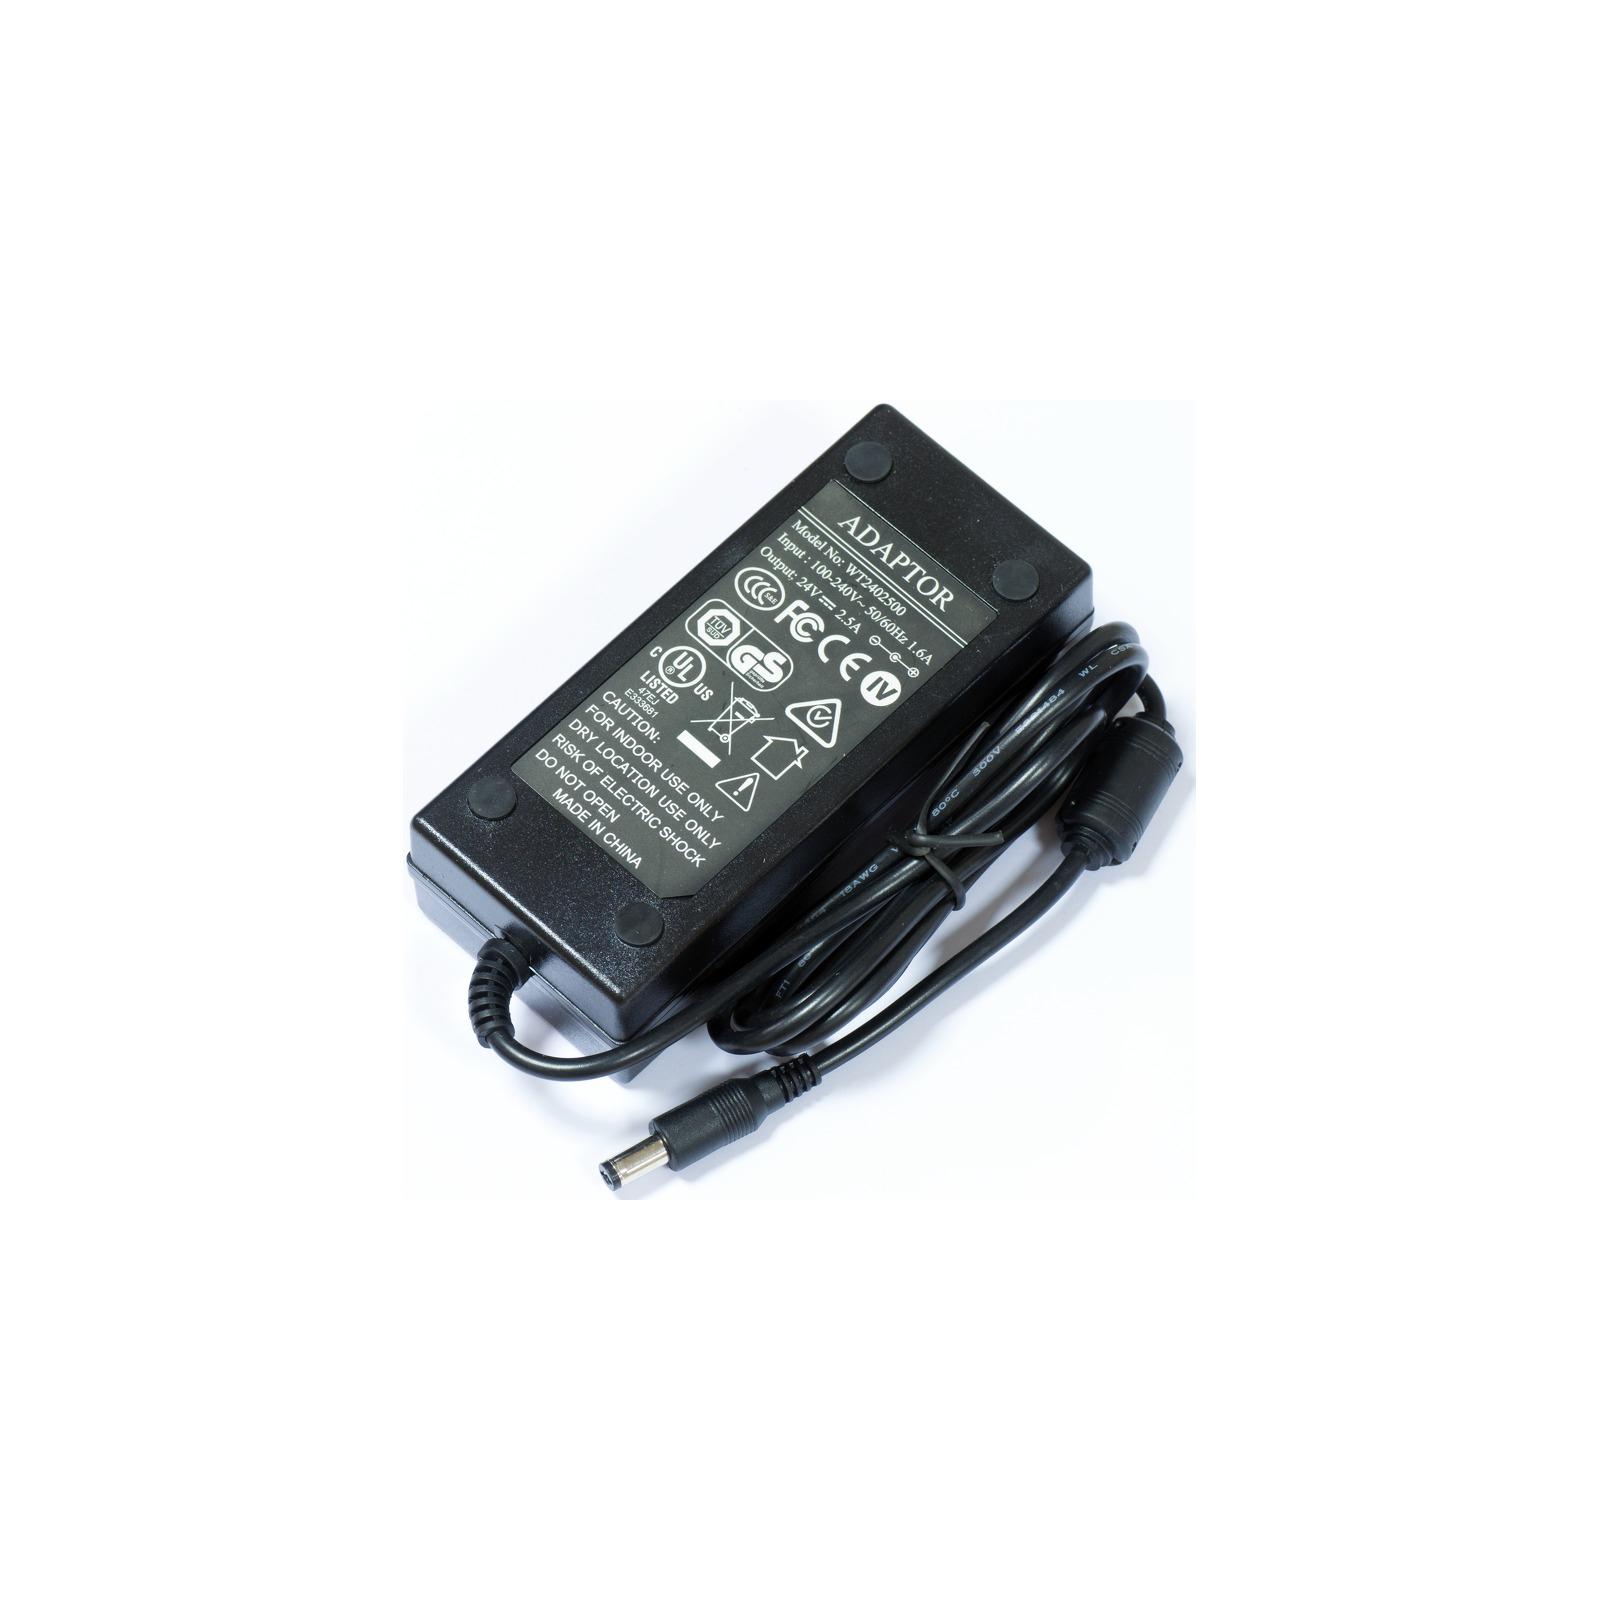 Маршрутизатор Mikrotik CCR1009-8G-1S-1S+PC изображение 3